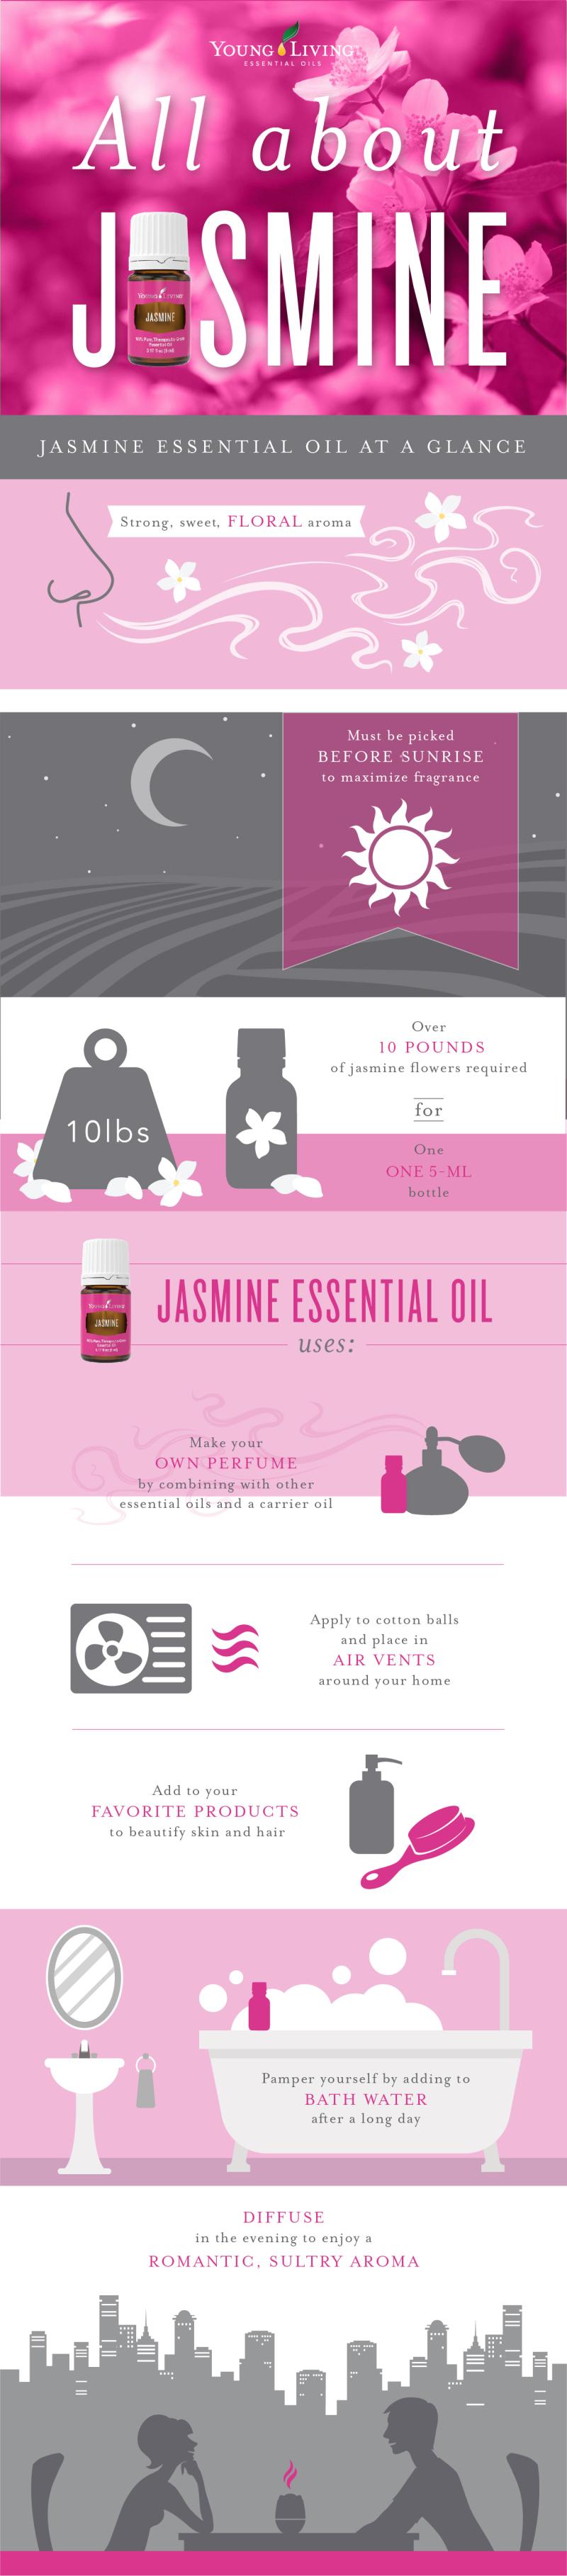 Blog_AllAboutJasmine_infographic_US-01-1